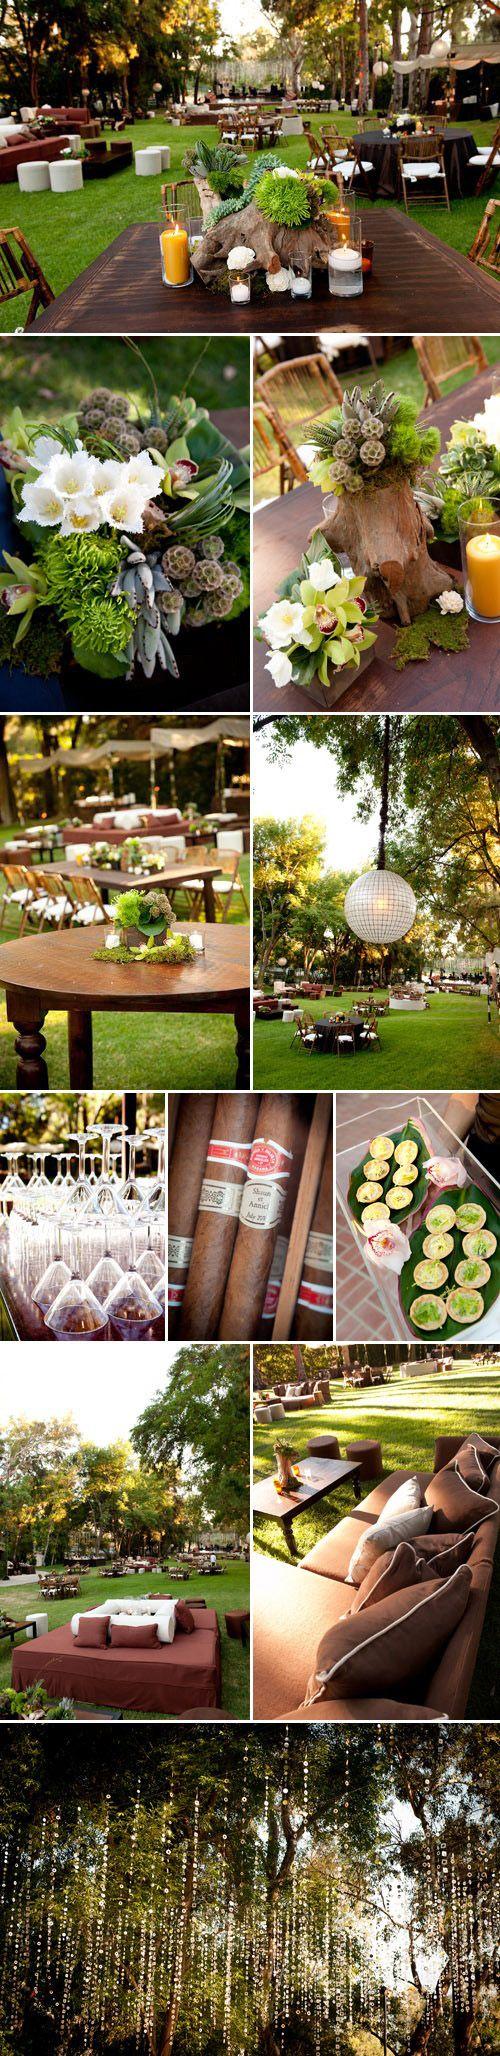 Wedding Decorations Re Rustic Woodland Garden Party Decor Gardens Wedding And Centerpieces